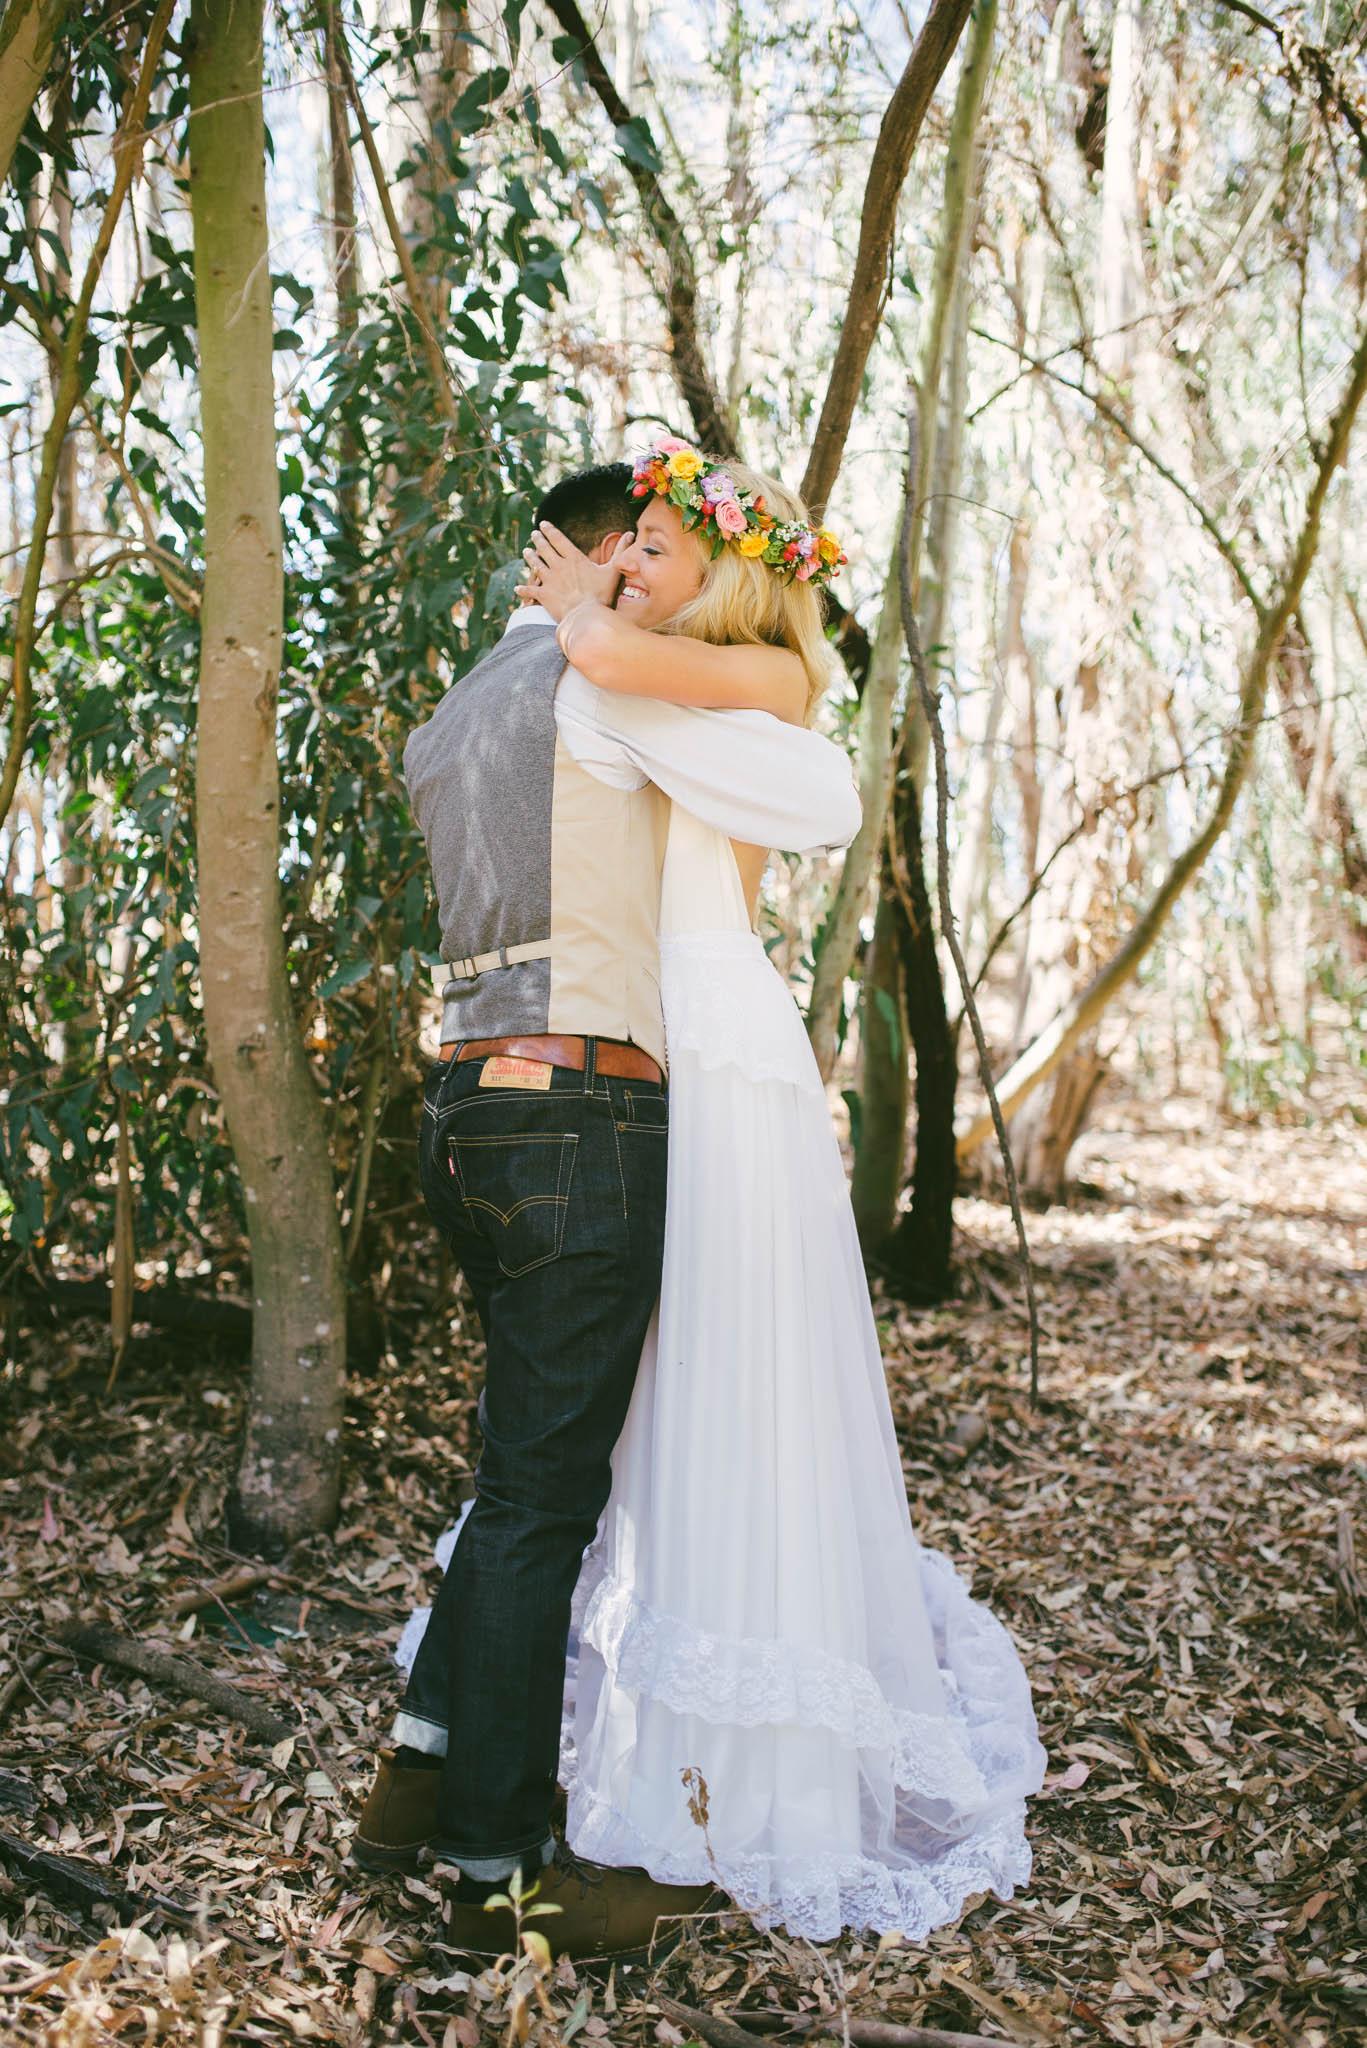 ©Isaiah & Taylor Photography - Los Angeles Wedding Photographer - Mexican Bohemian Wedding, Laguna Niguel Regional Park, Orange County-12.jpg